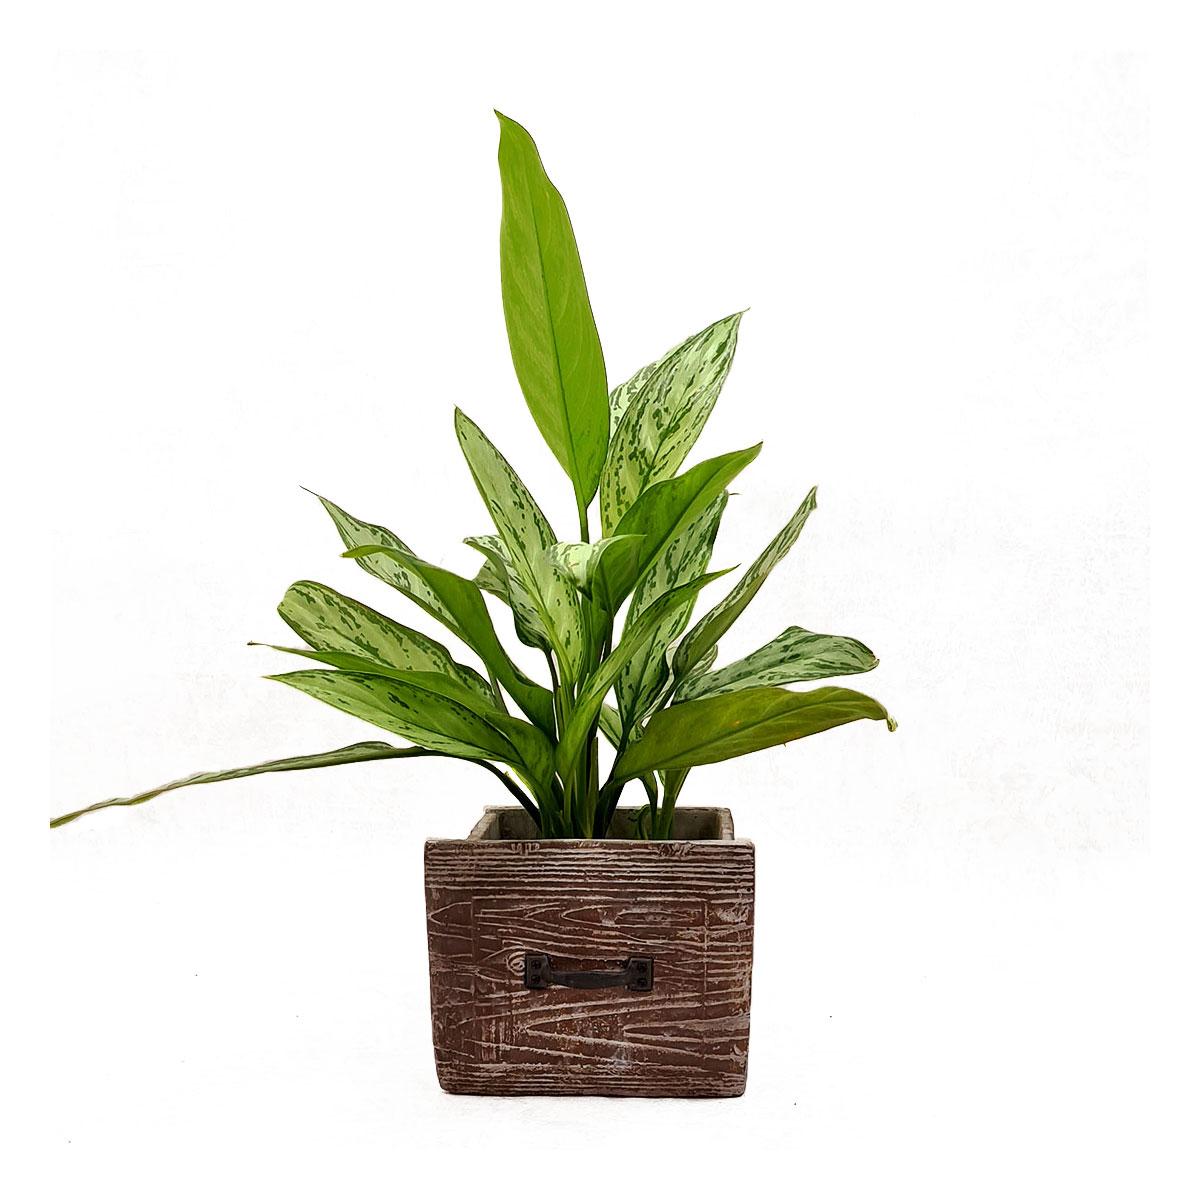 Vazoninis augalas AGLAONEMA (AGLAONEMA), be vazono